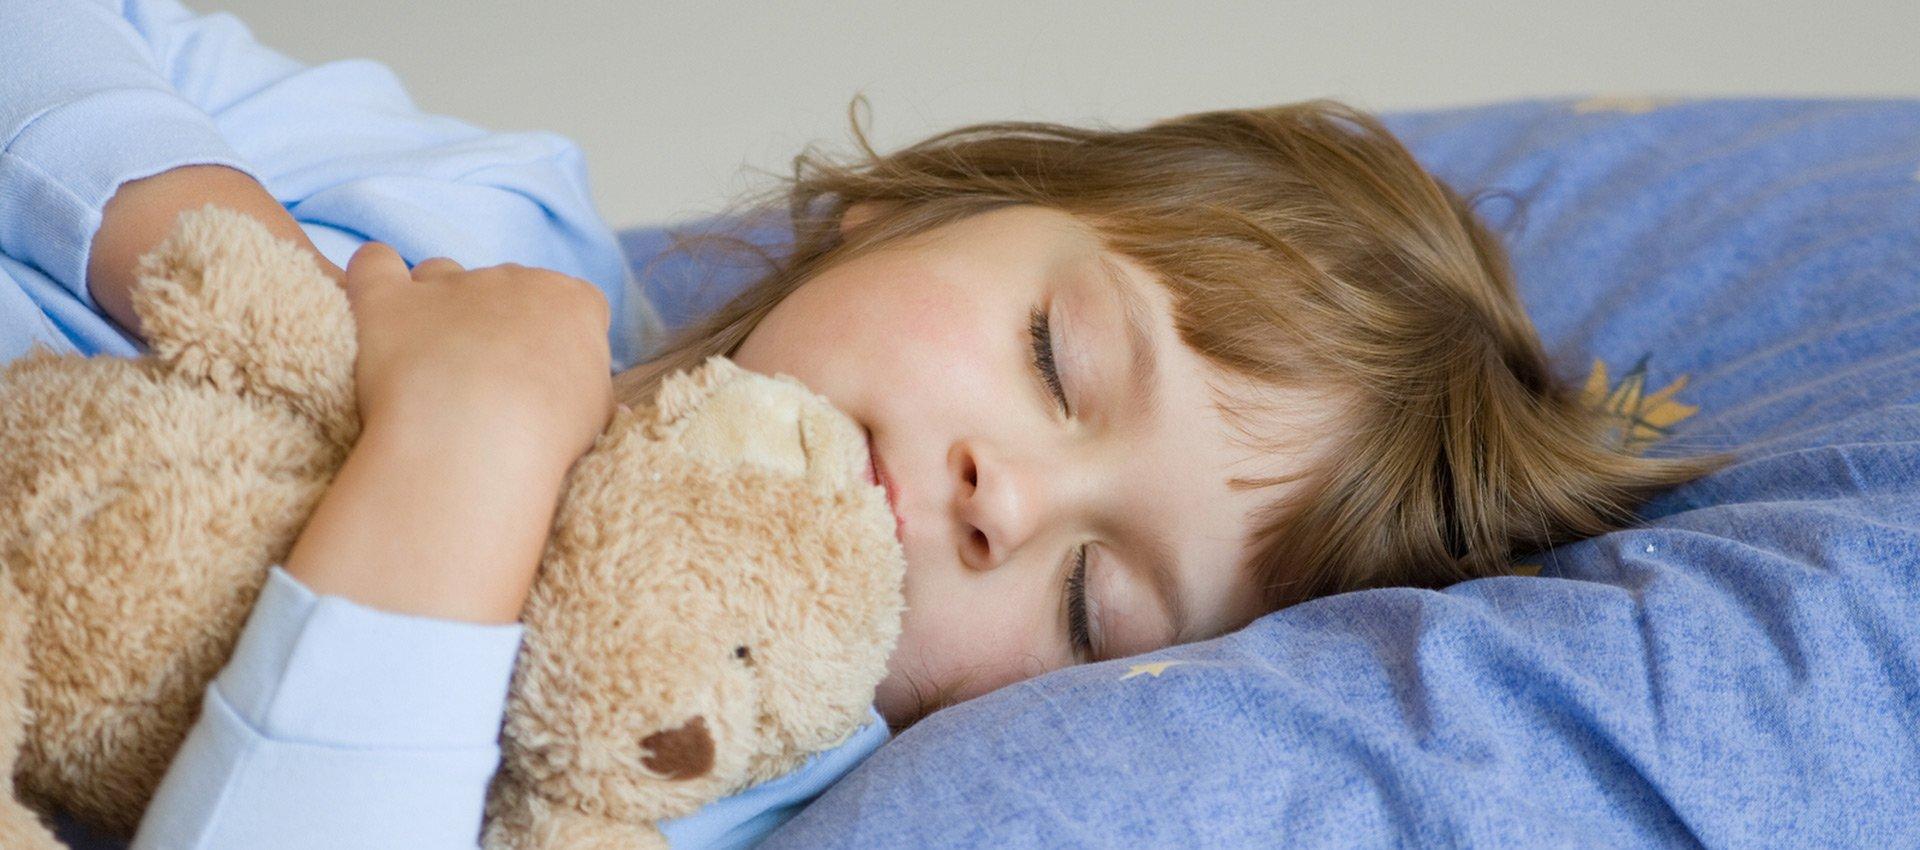 Мягкие игрушки оптом и в розницу